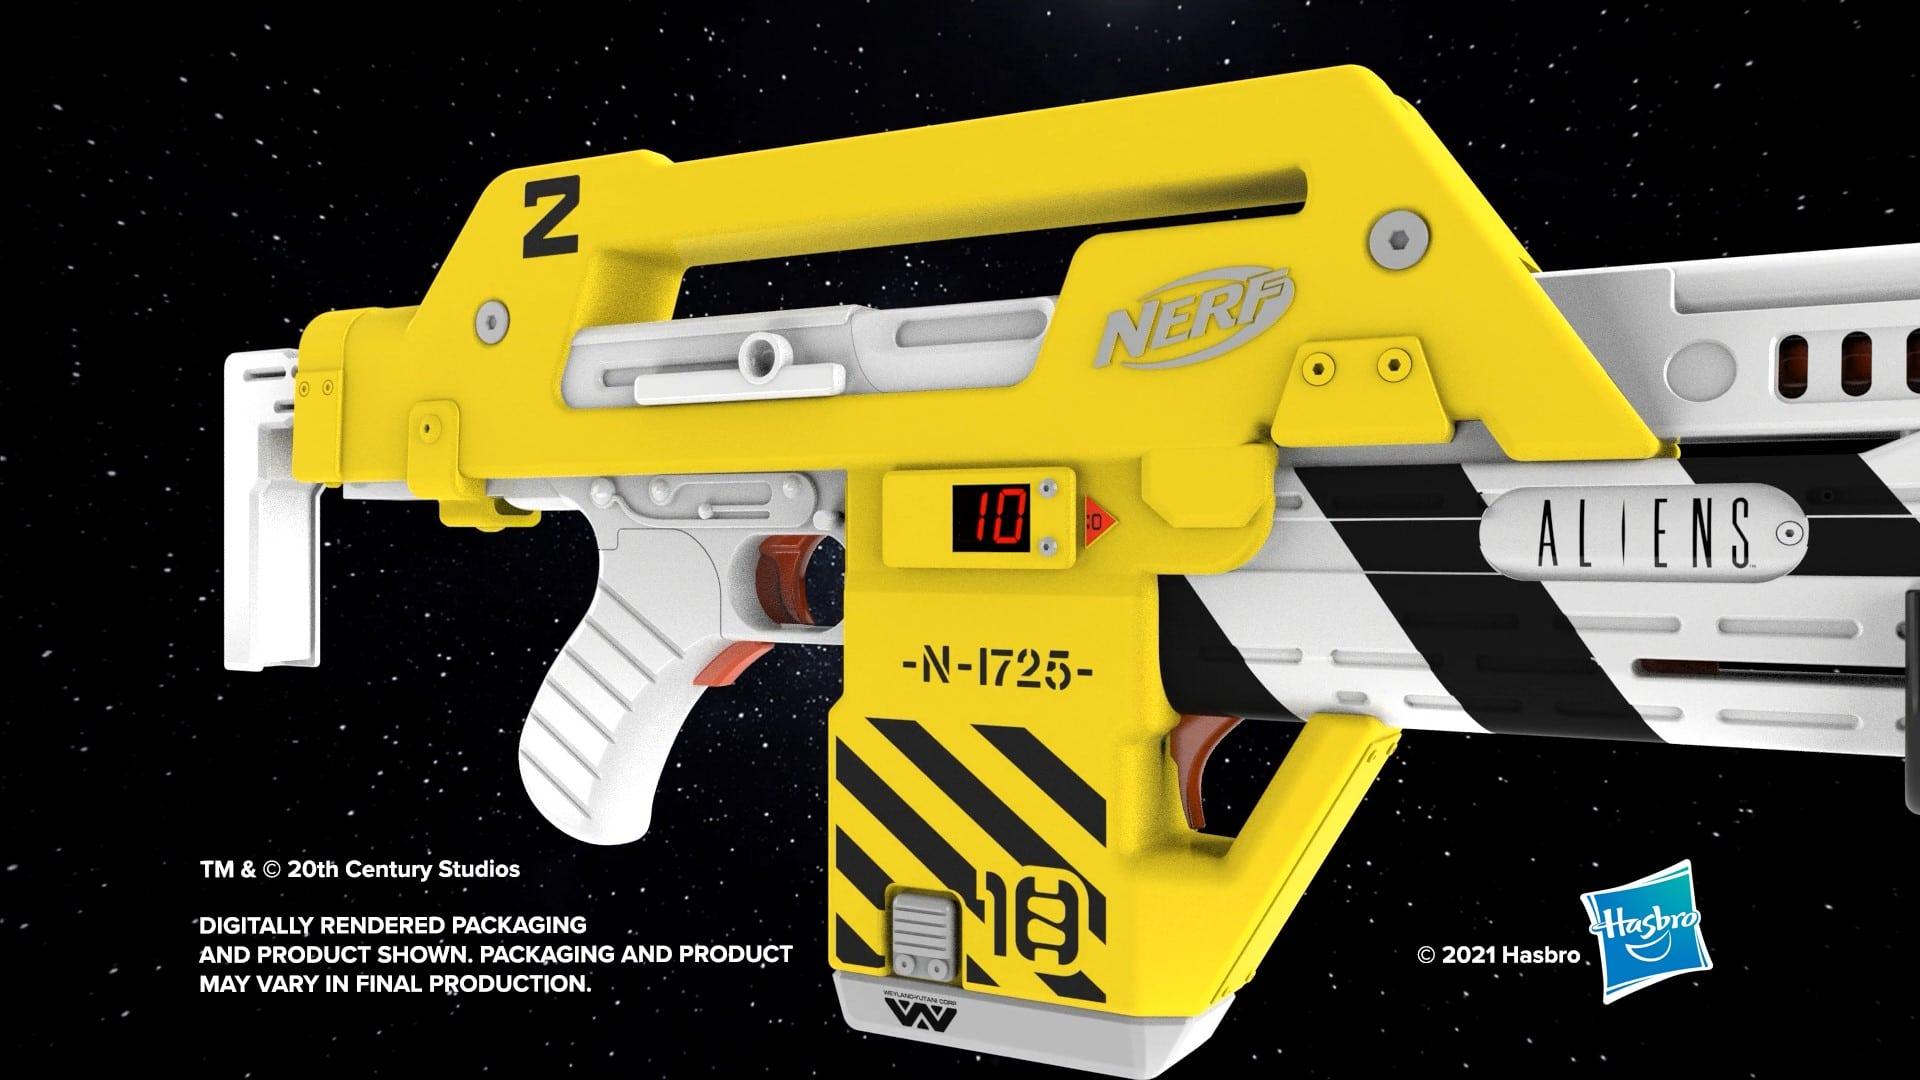 Hasbro creates a Nerf blaster based on the sci-fi film Aliens 18